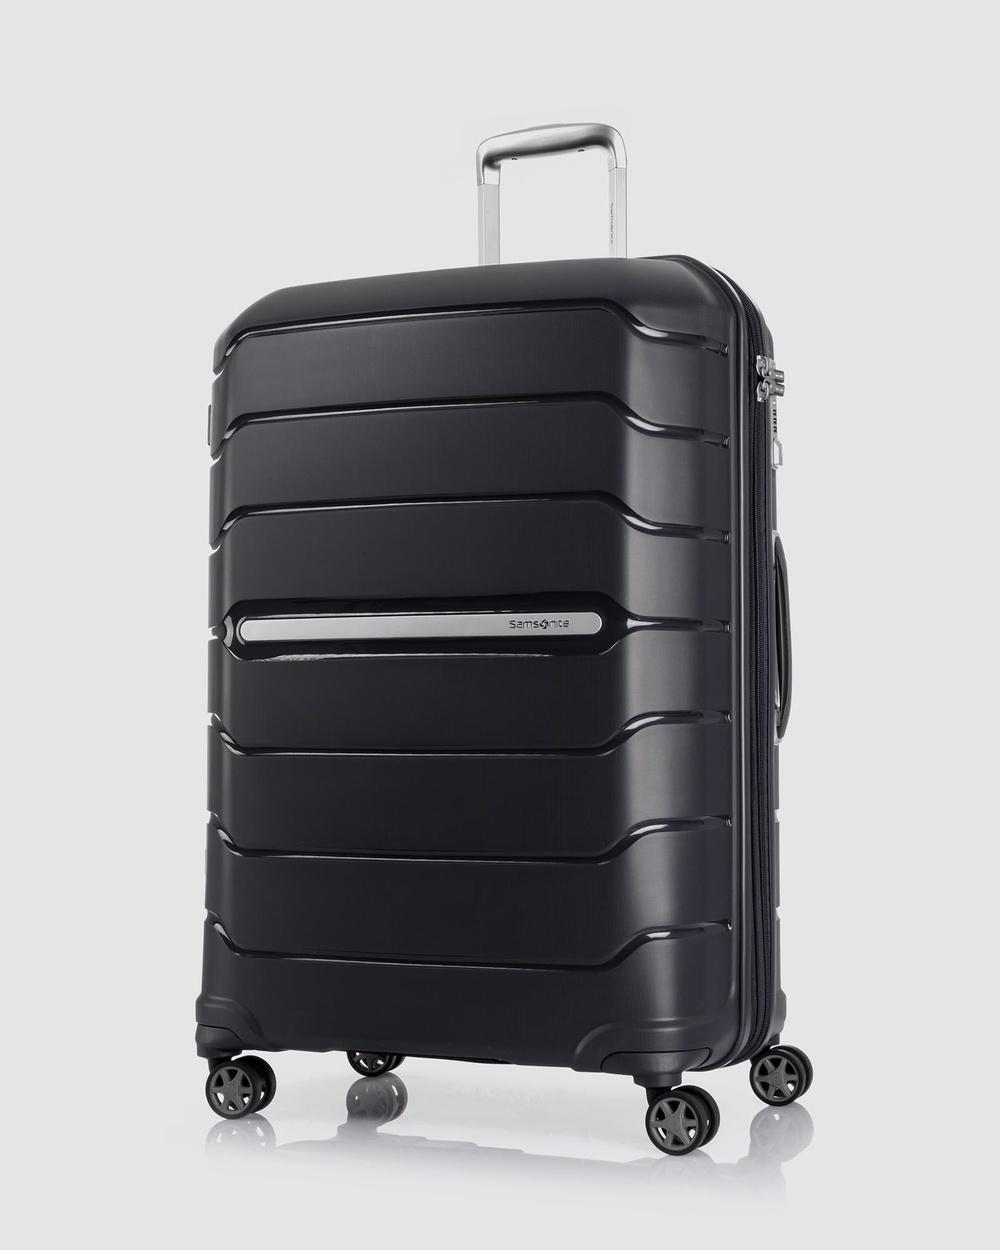 Samsonite Oc2Lite 75cm Spinner Suitcase Travel and Luggage Black